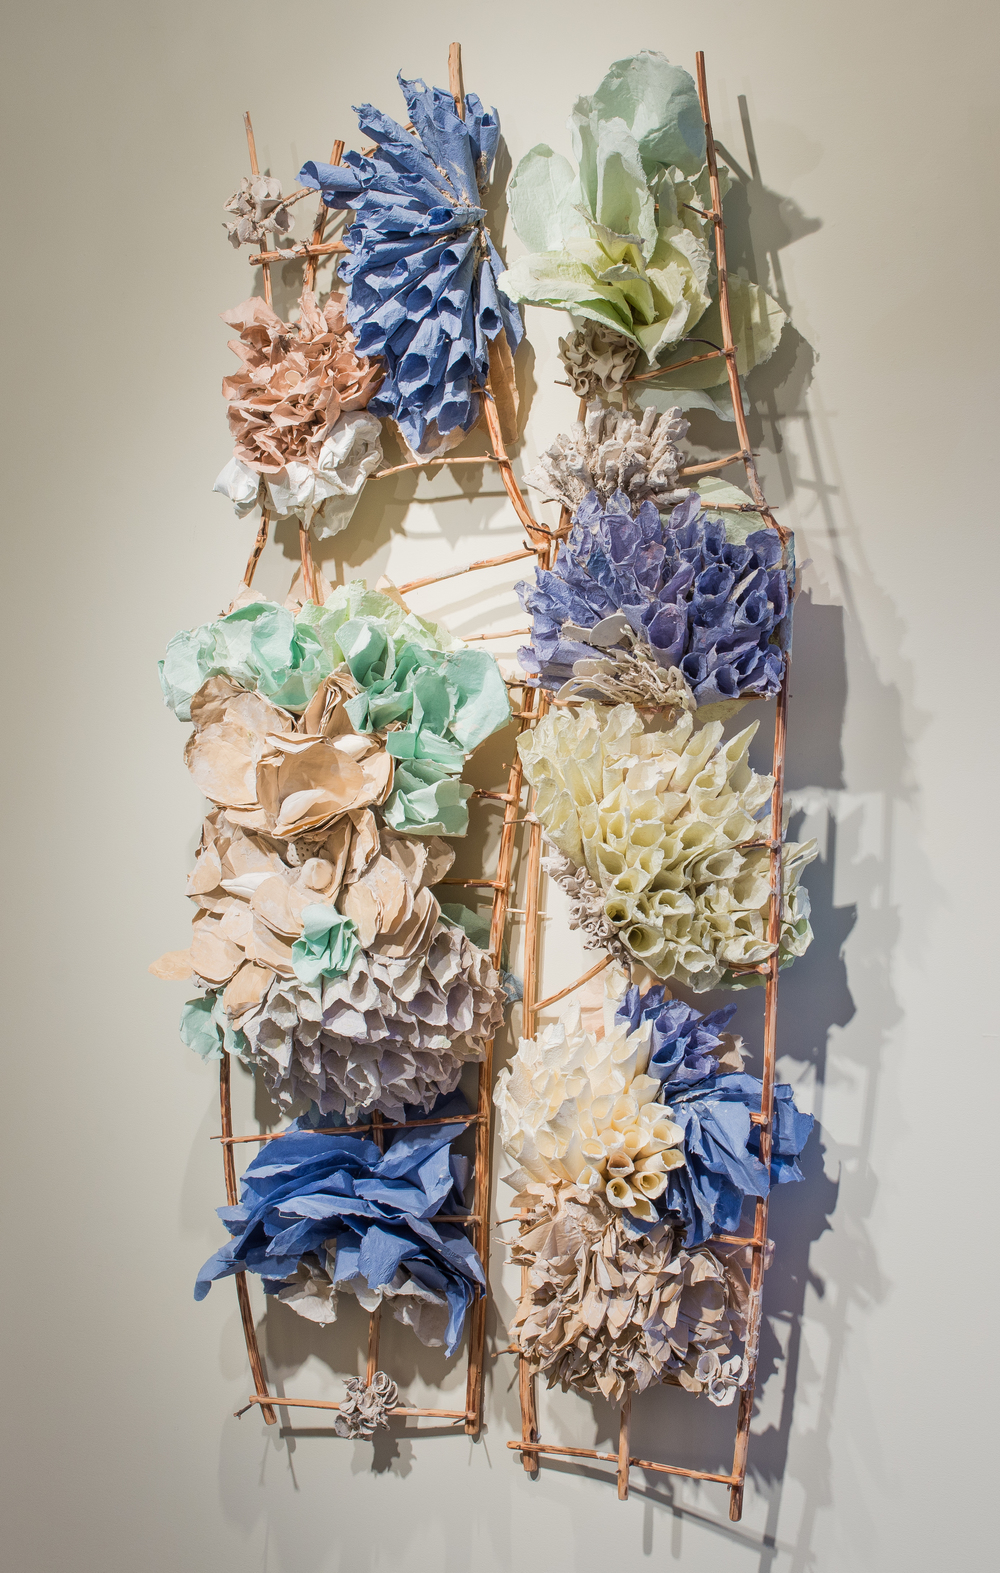 "Bi-Fold Purple, 2014  Porcelain paper clay, handmade paper, organic material  65"" x 35"" x 13""  $6500"